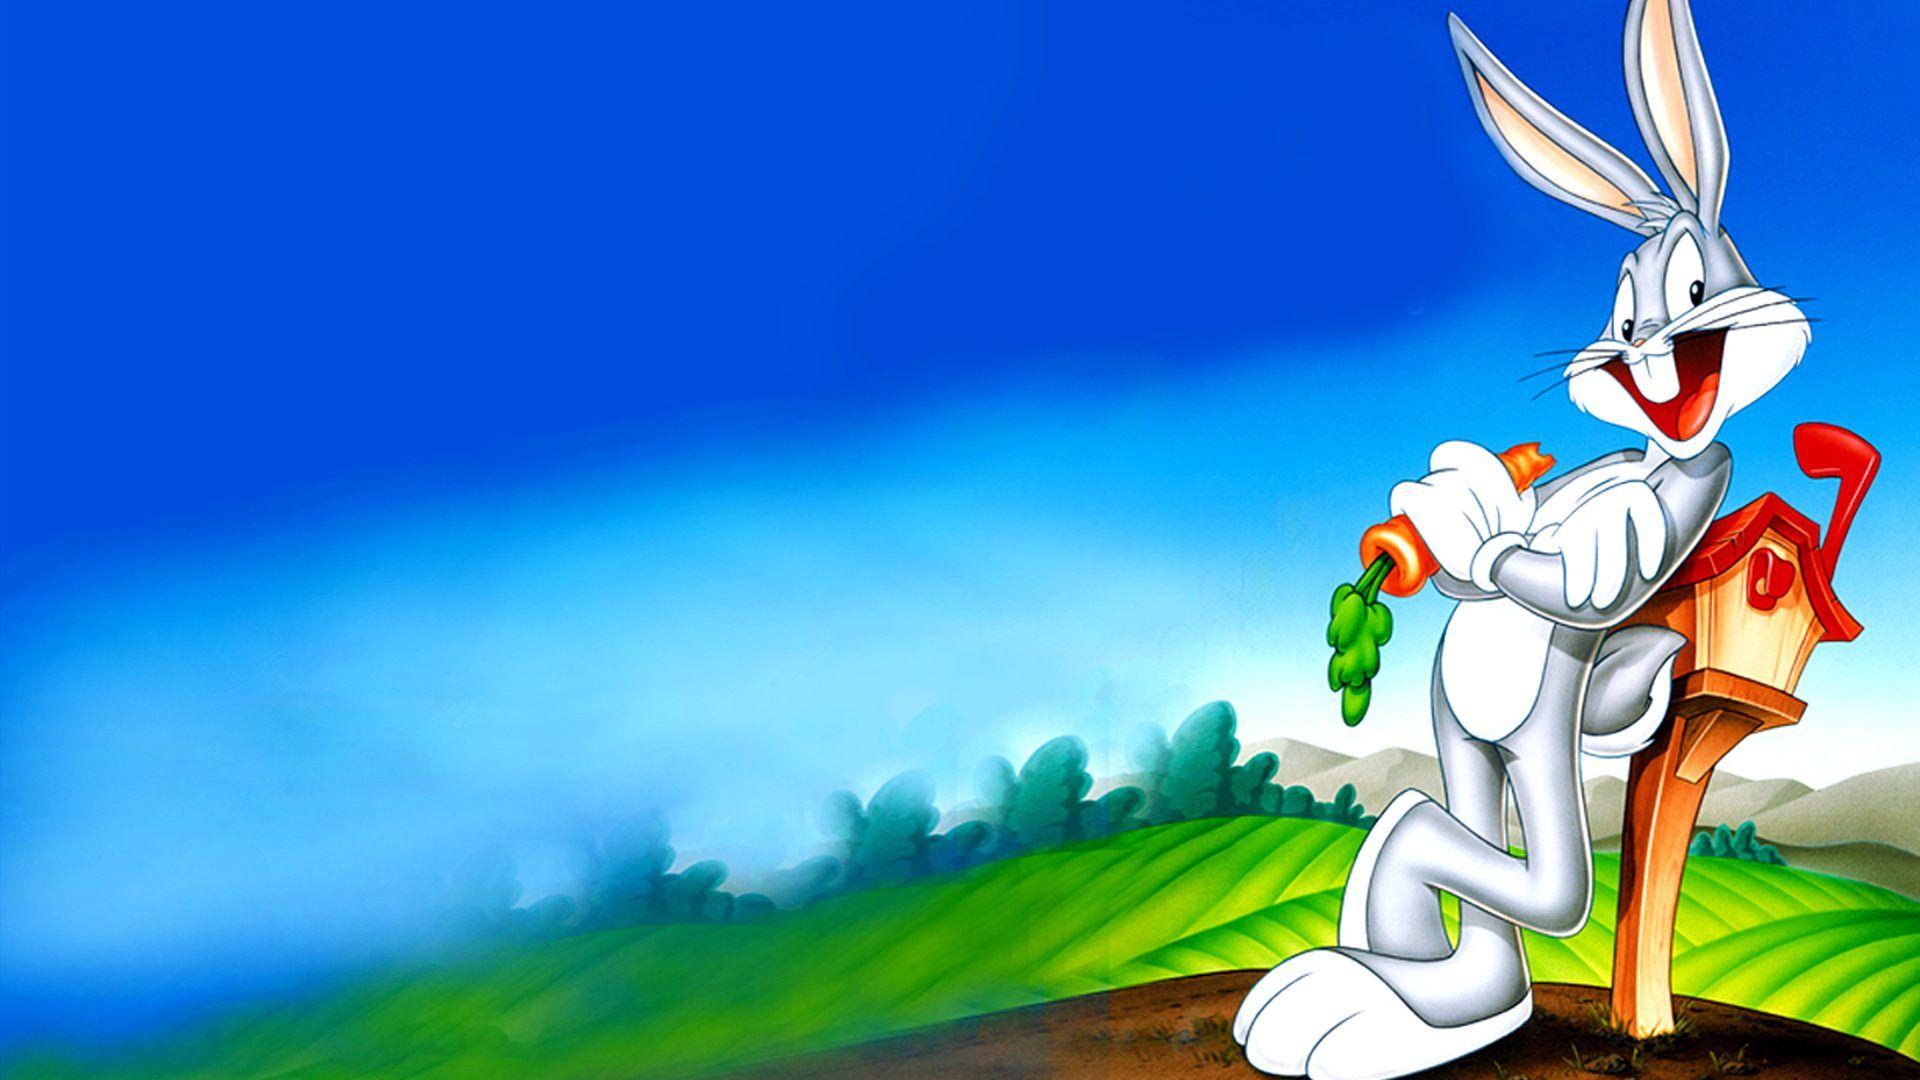 Looney Tunes Cool HD Wallpaper